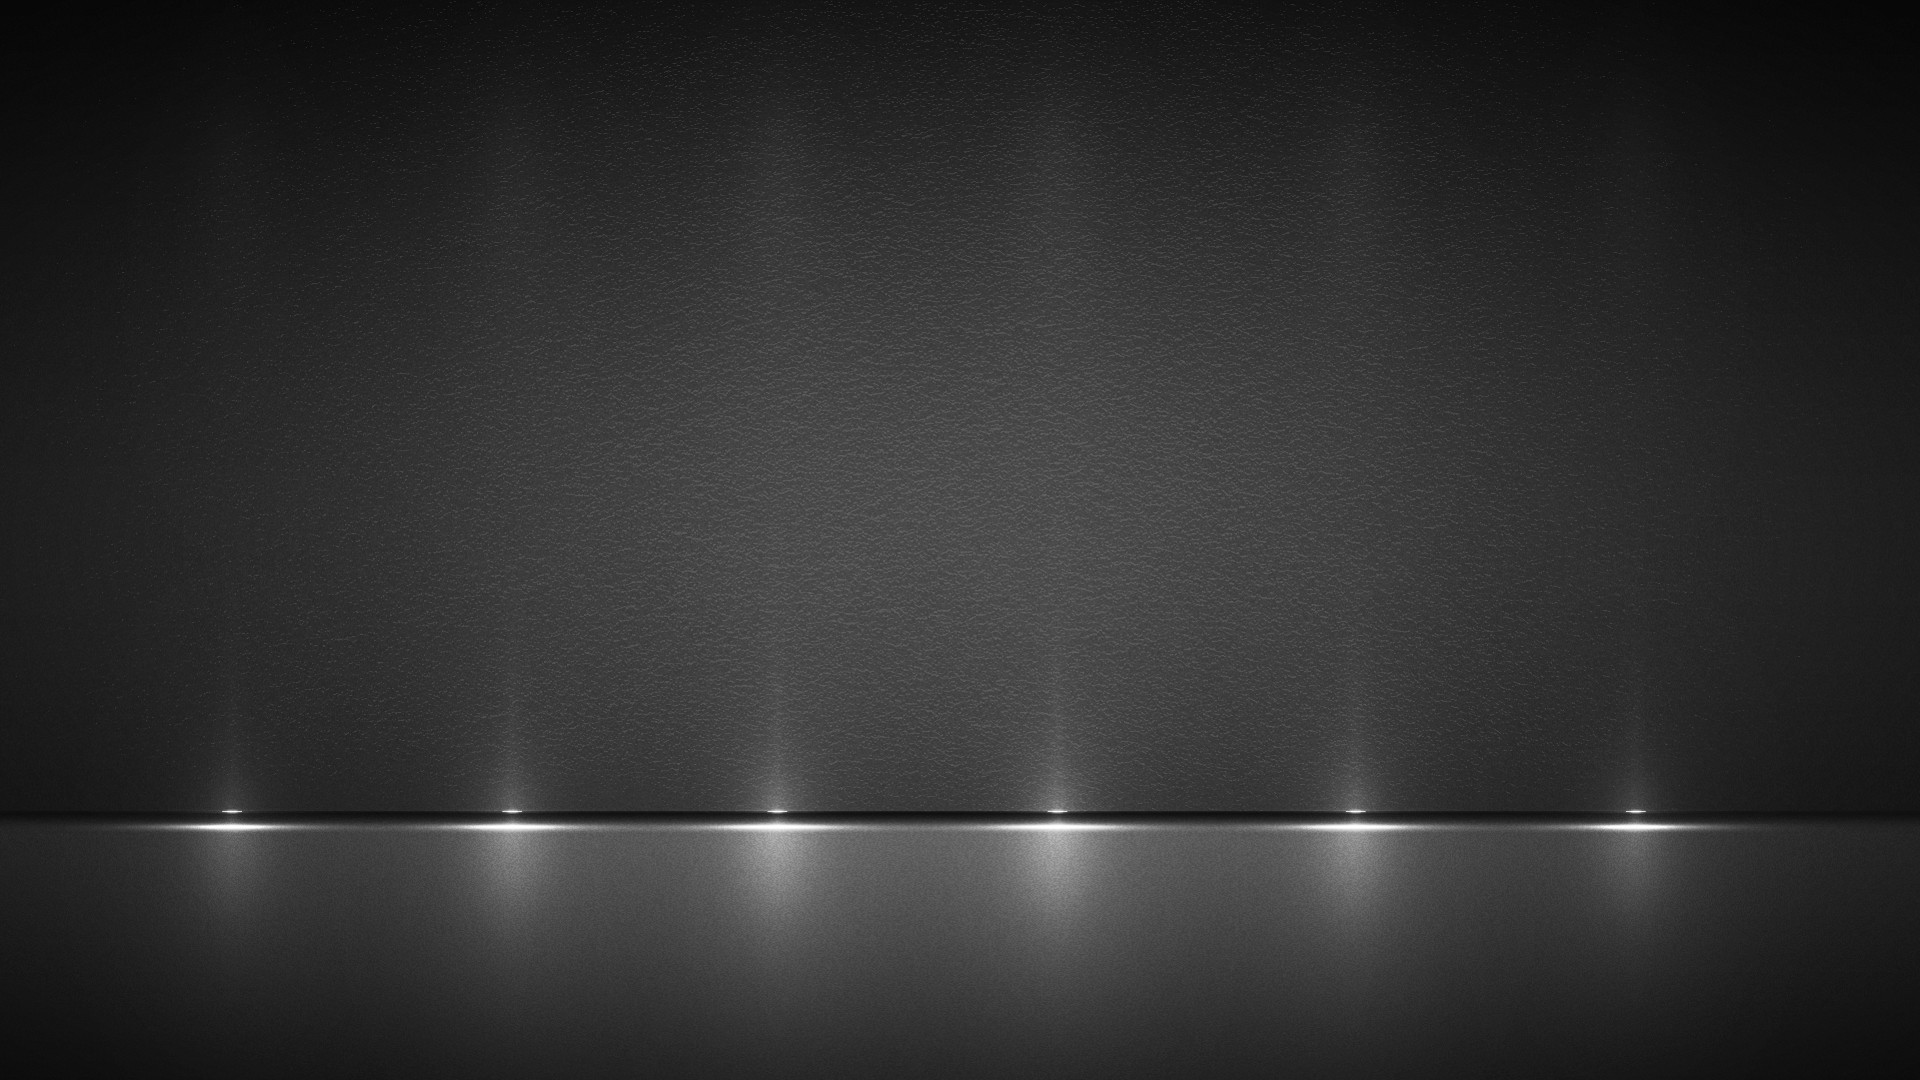 grey-illumination-background-presentations-powerpoint-backgrounds.jpg .